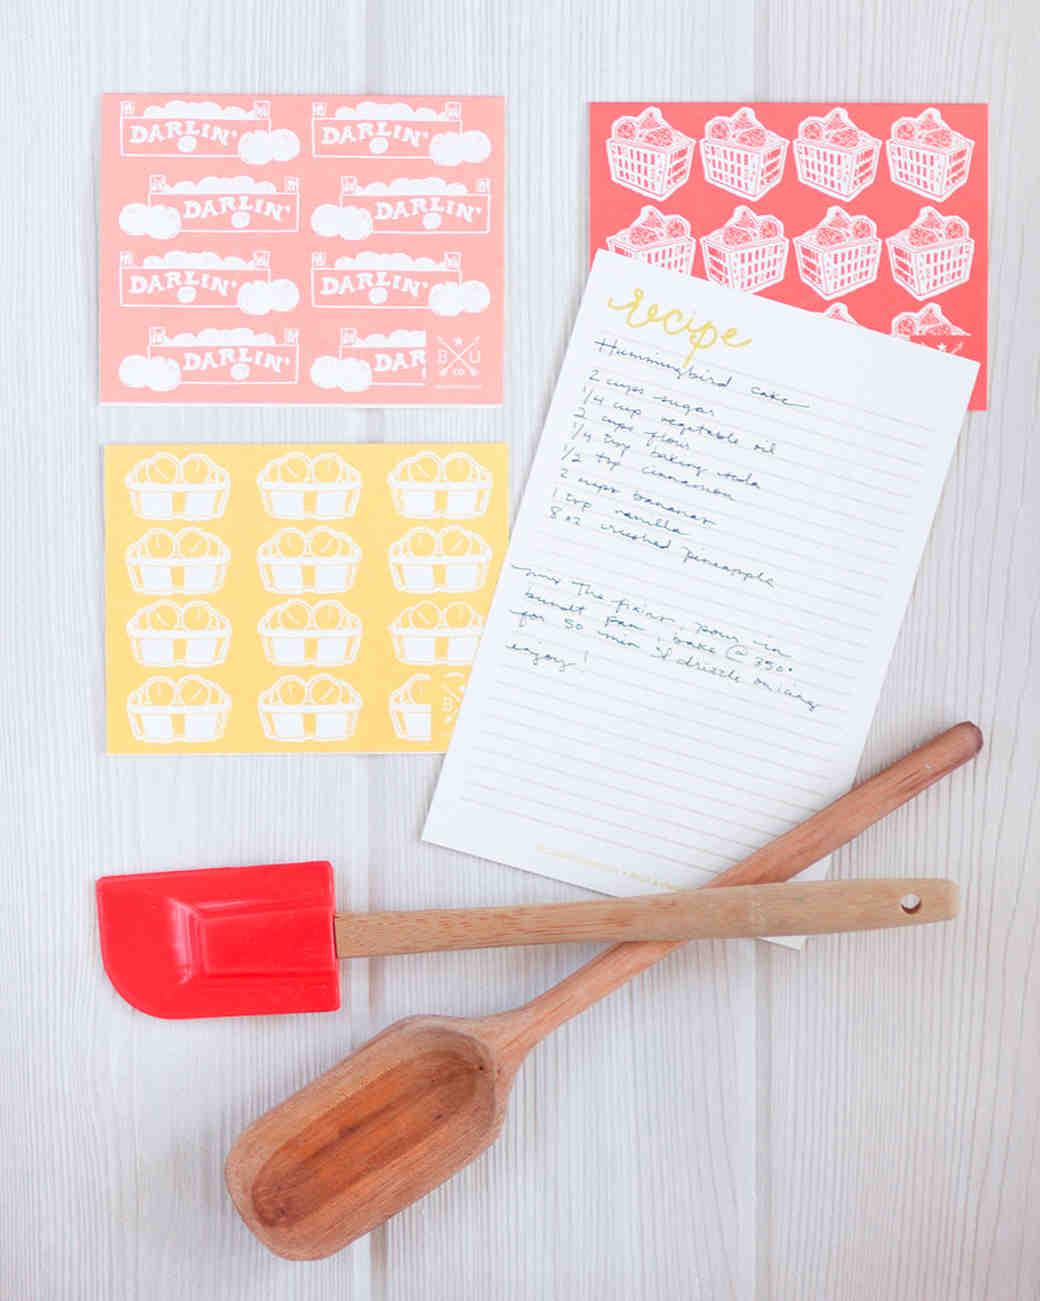 recipe-cards-belle-union-fruit-0315.jpg